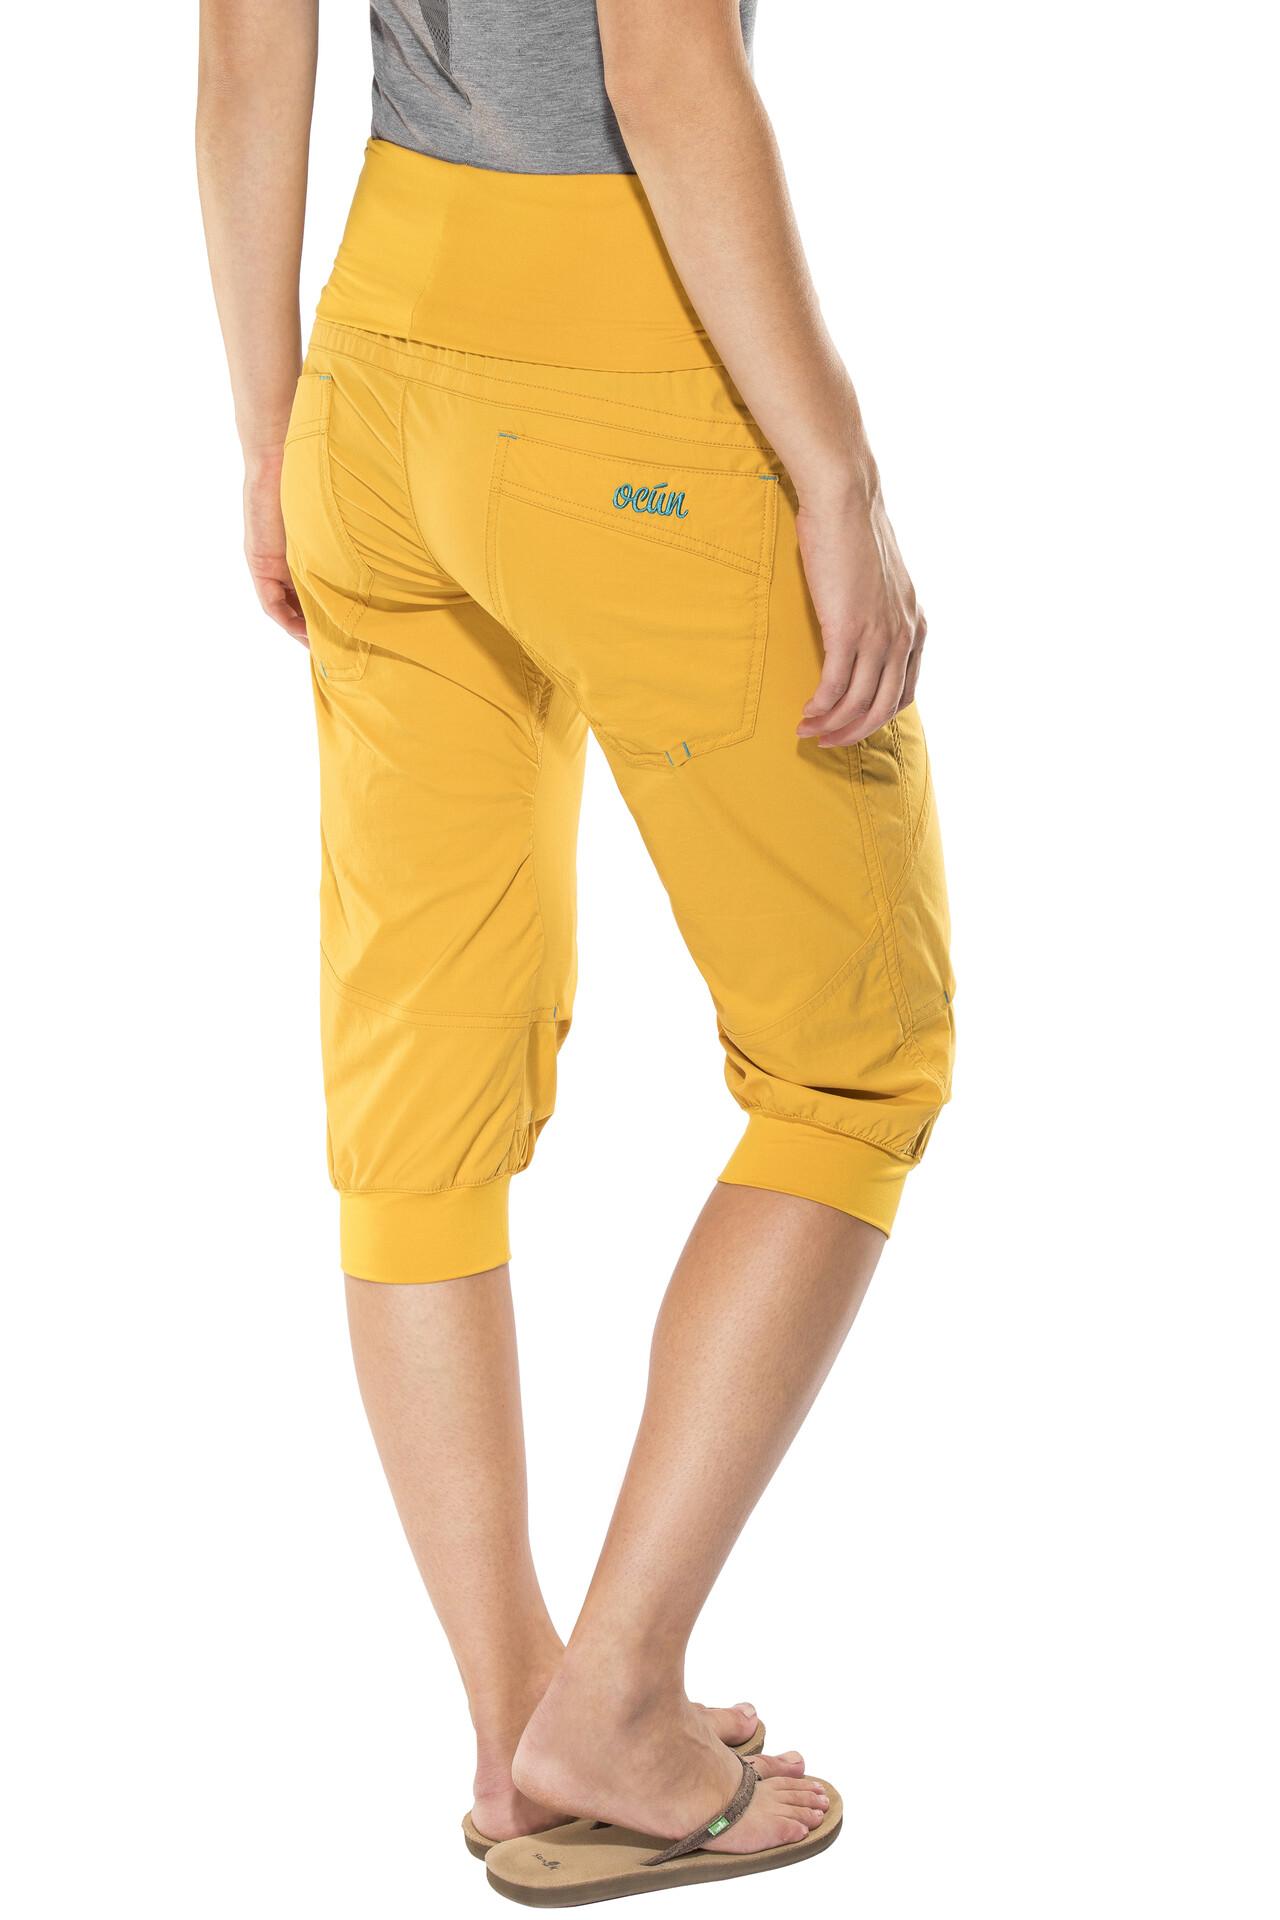 amarillo cortos Pantalones Mujer Noya Ocun xzHZc 1d45dc1eaece